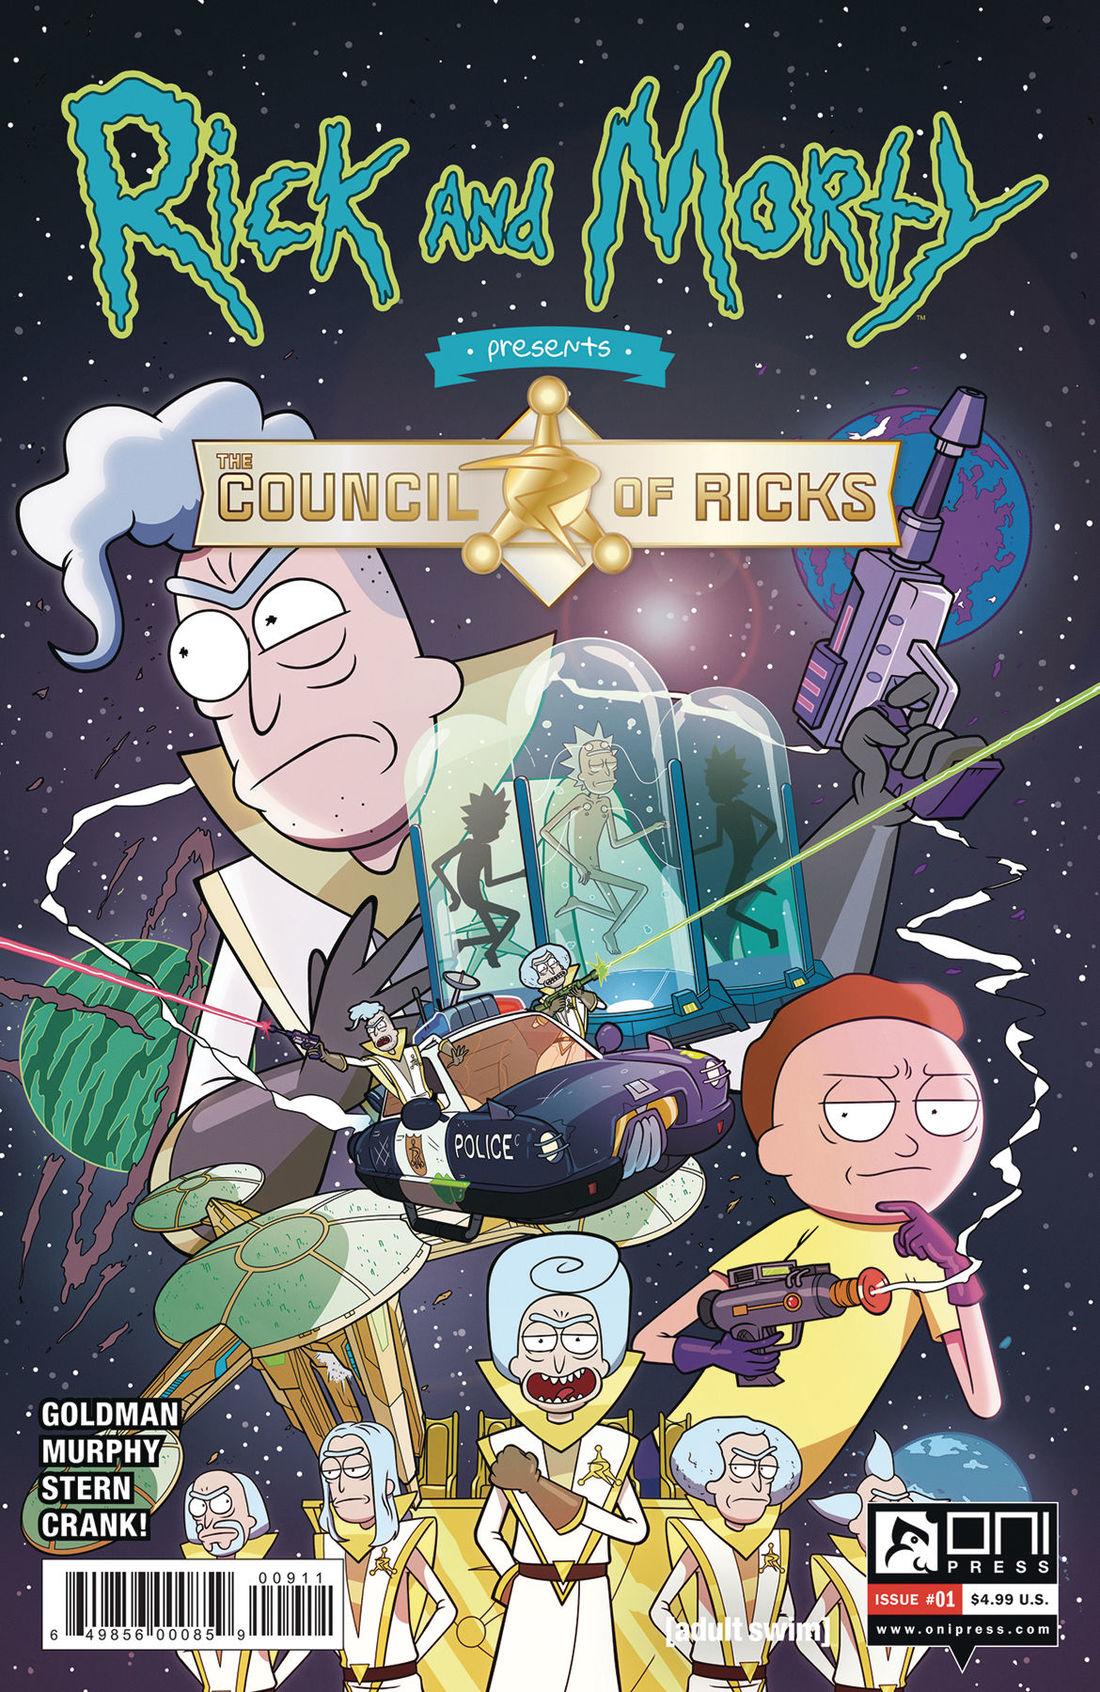 Rick and Morty Star in Pringles Creepy Meta Super Bowl Ad